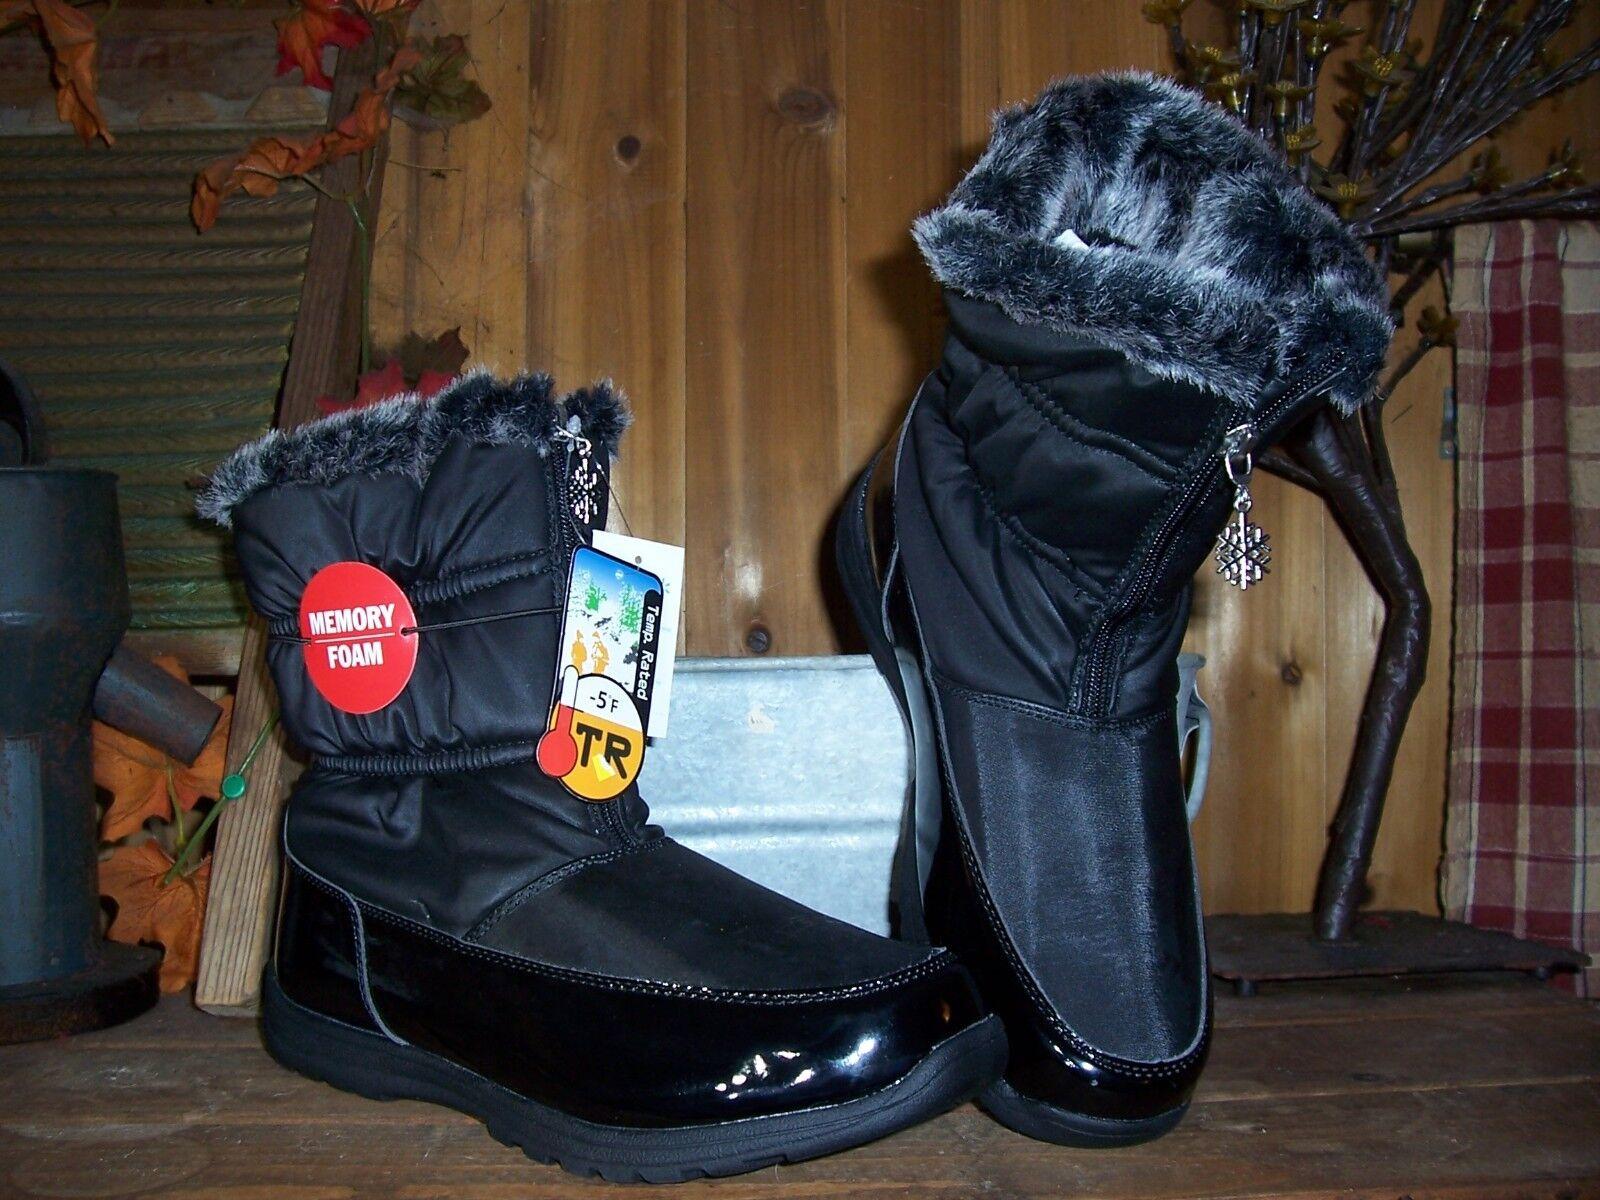 LADIES MEMORY FOAM WINTER BOOTS SIZE 9 SNOWFLAKE BLACK SNOWFLAKE 9 DESIGN ZIPPER FUR TOP c7a913